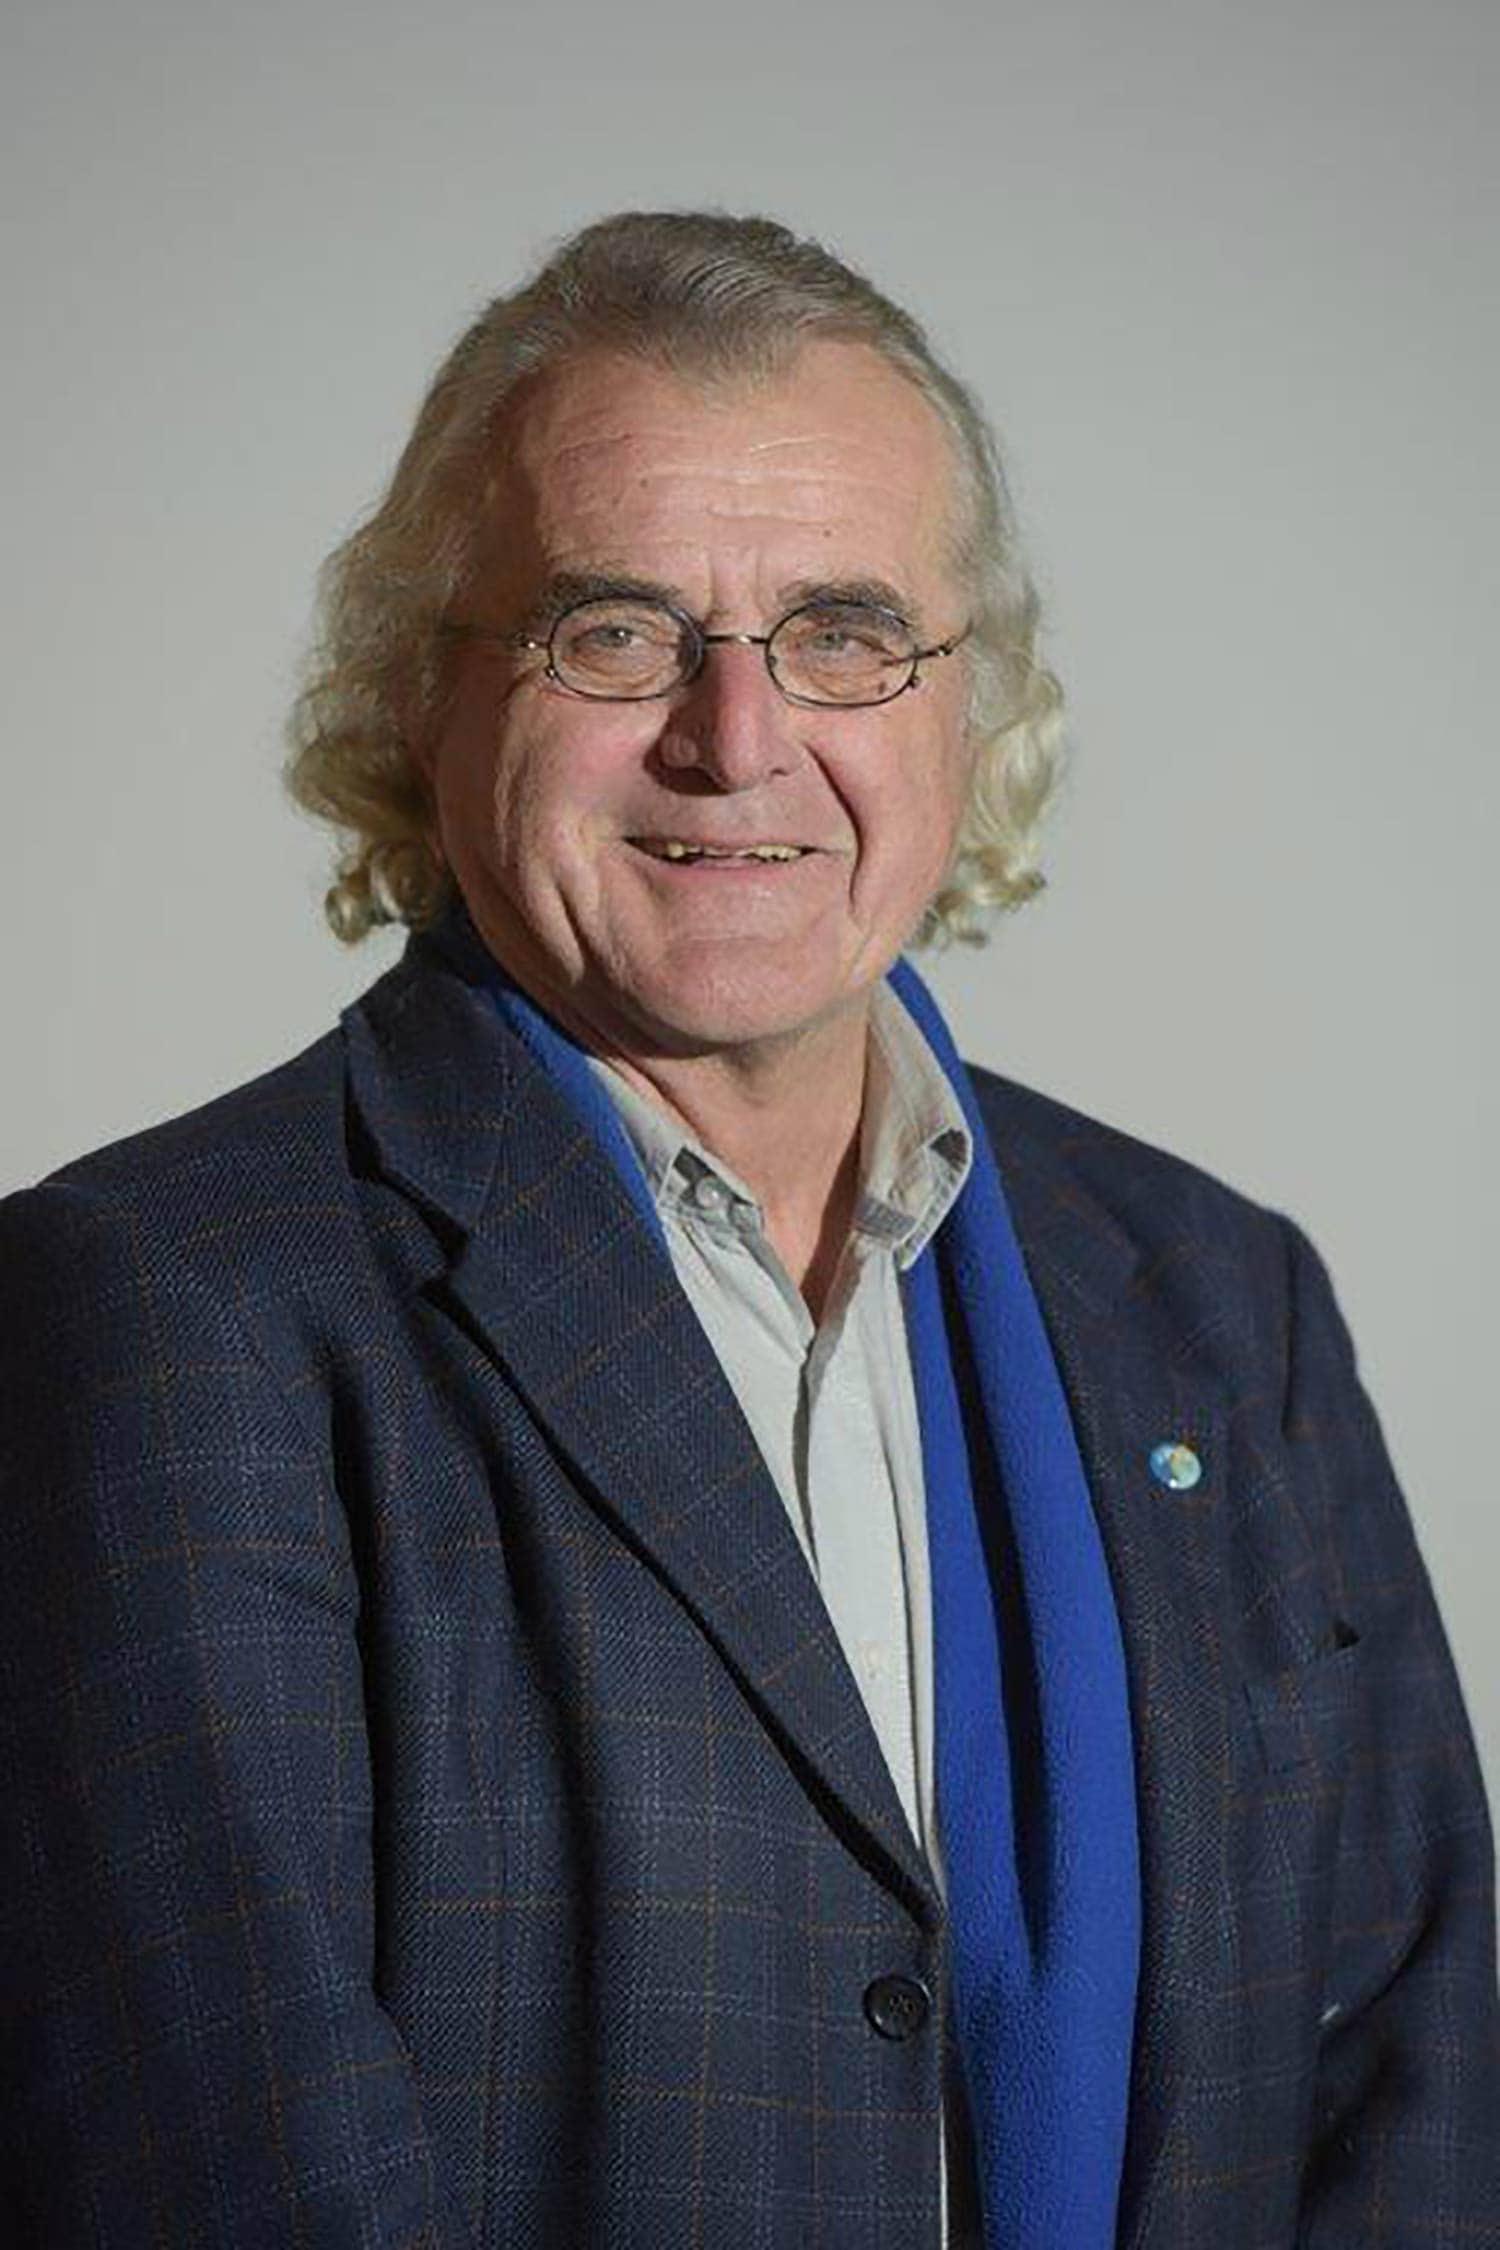 Freie Wähler - Günther Riepl (73) Dipl. Ingenieur (FH) Foto: Freie Wähler